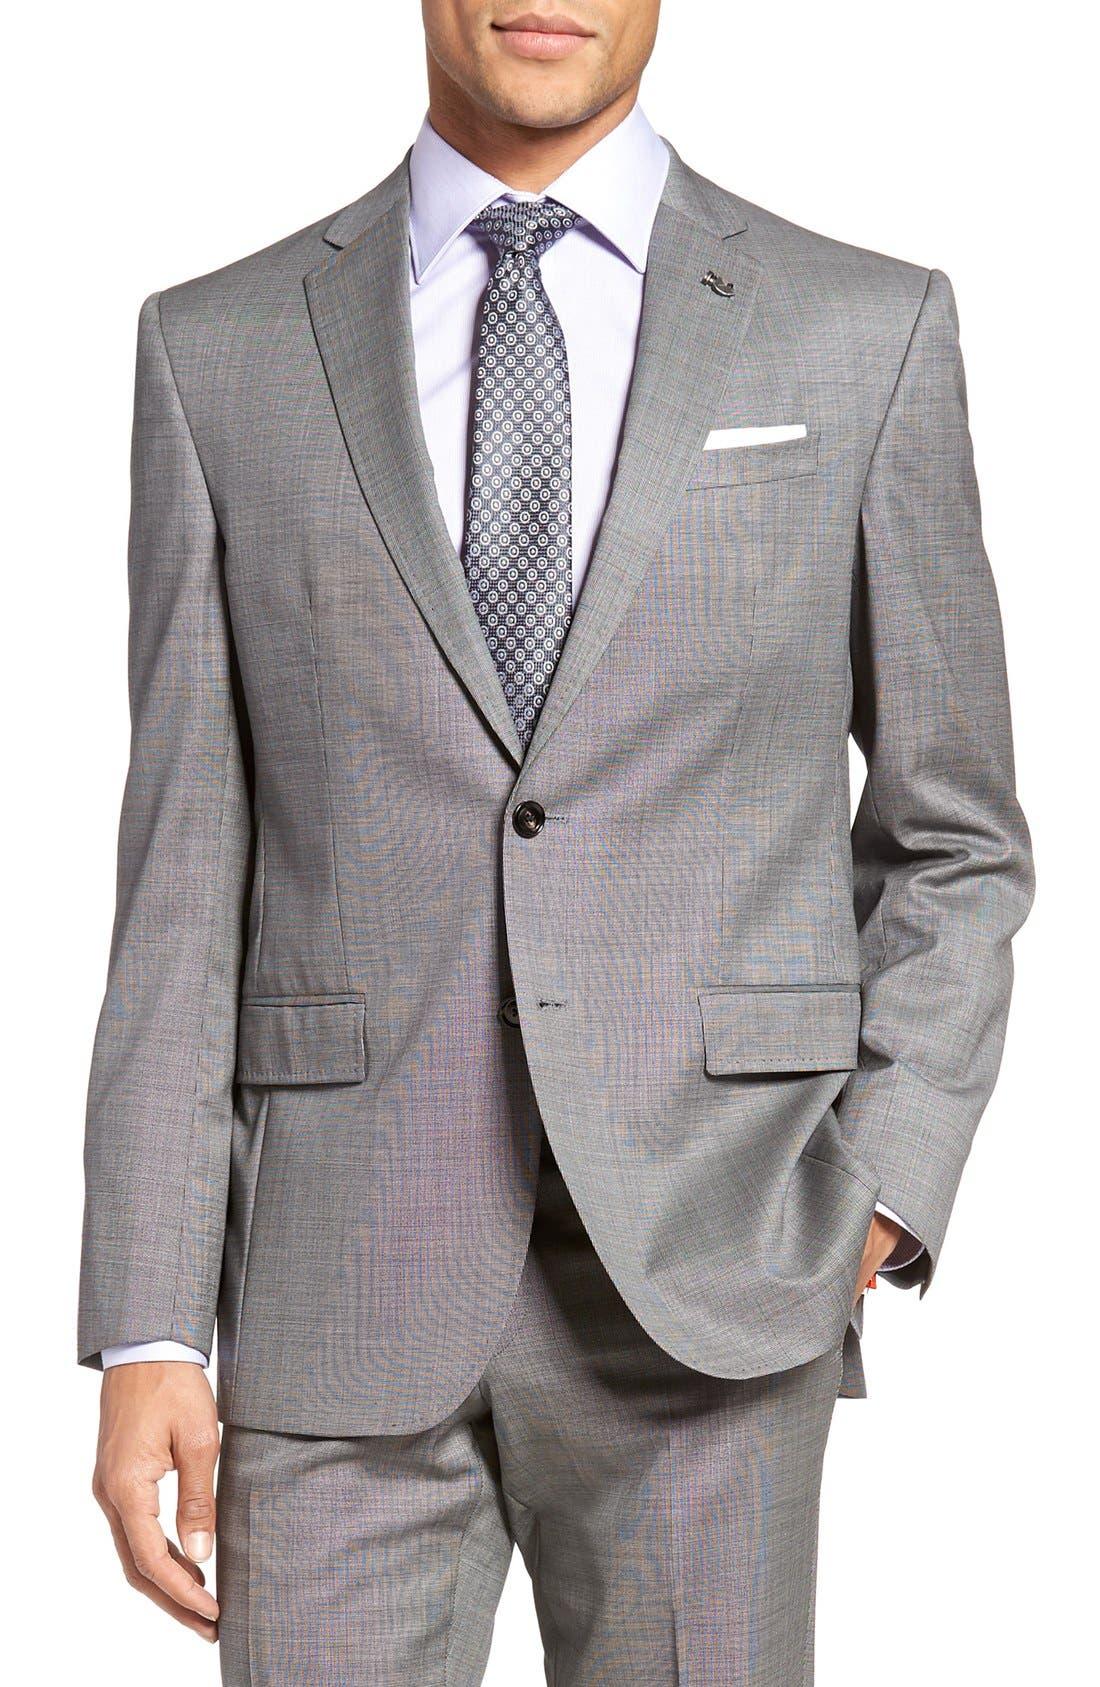 Jay Trim Fit Solid Wool Suit,                             Alternate thumbnail 15, color,                             LIGHT GREY